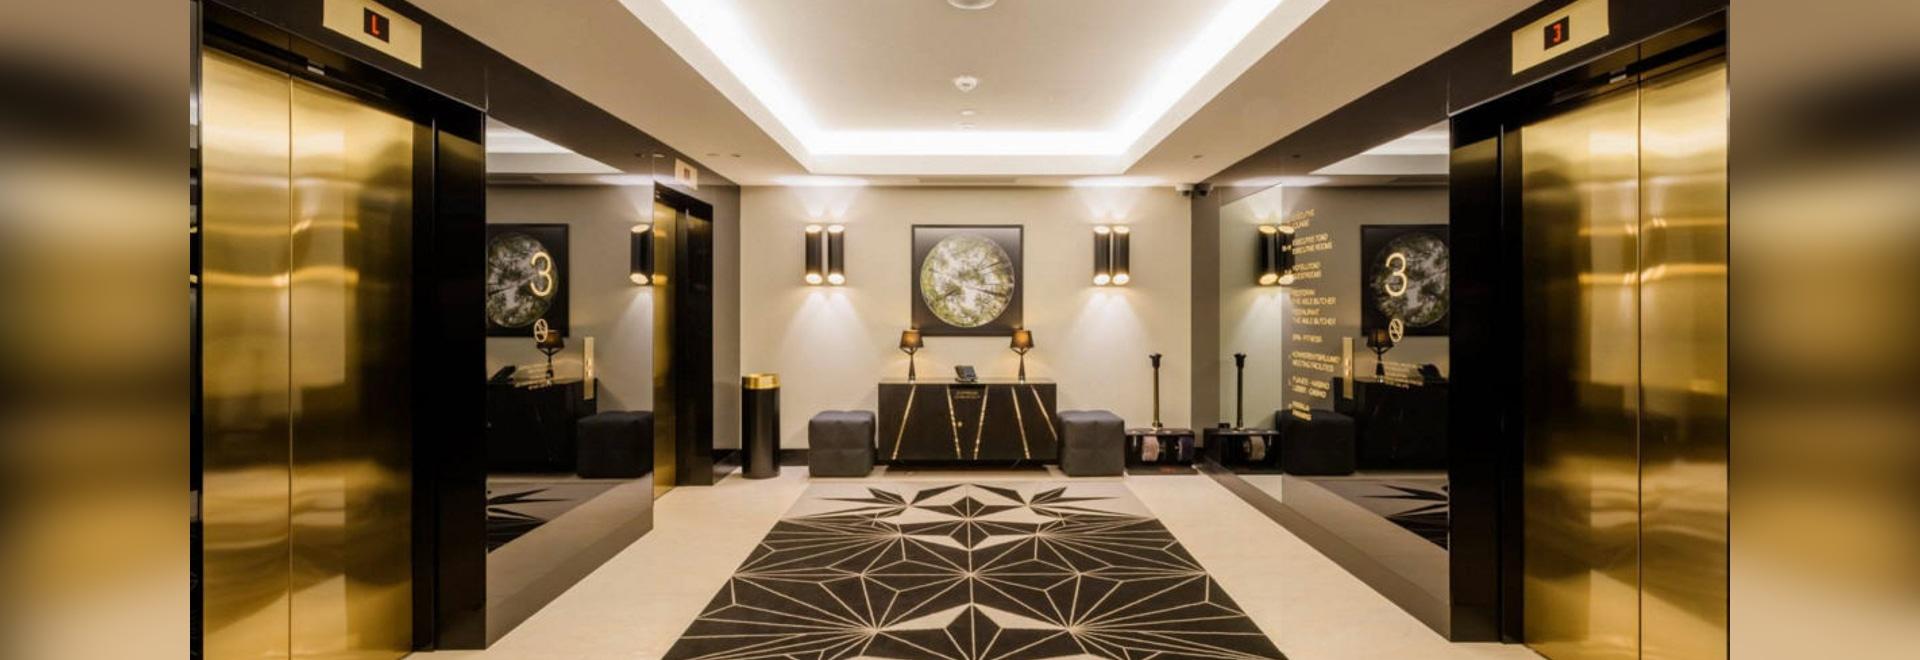 Hotel Hilton Tallinn